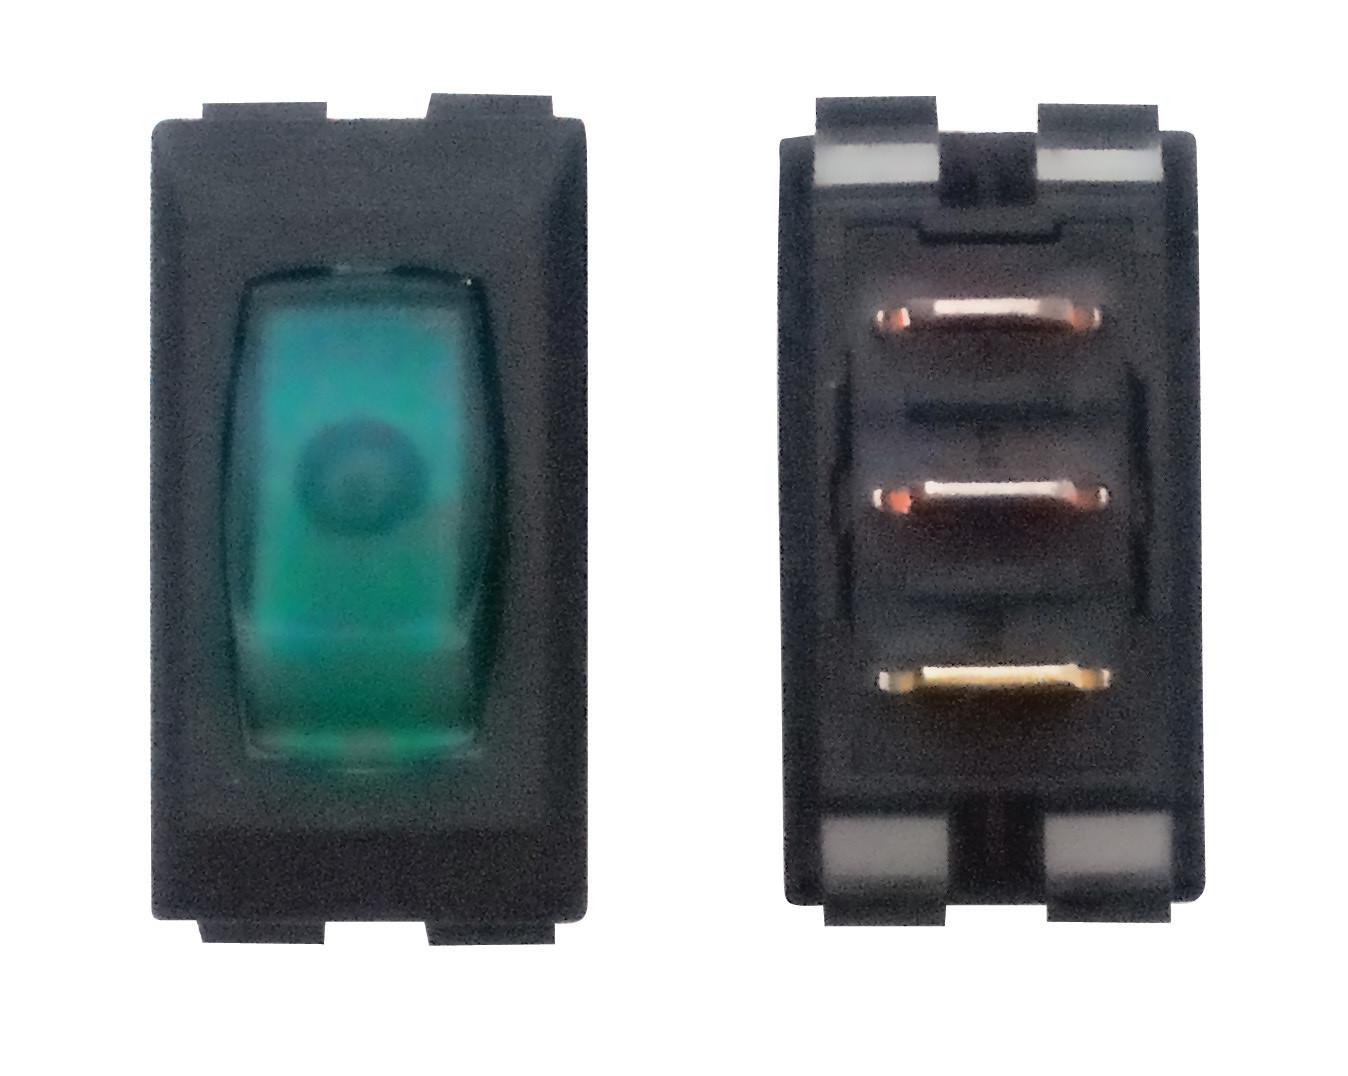 Illuminated On/Off Switch - Green/Black 1/card